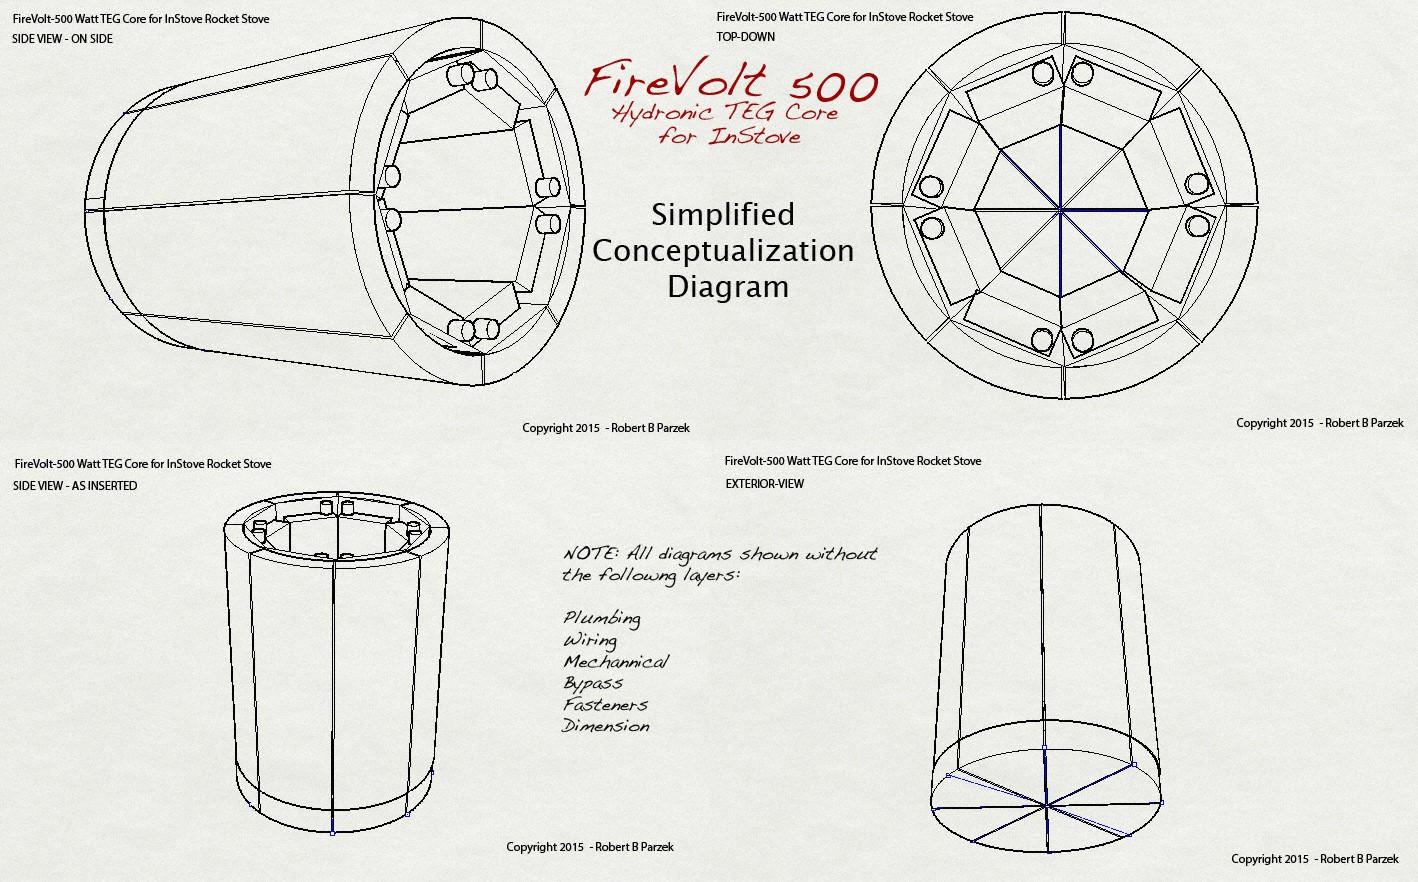 Wh Keystone Stove Wiring Diagram Free Diagram